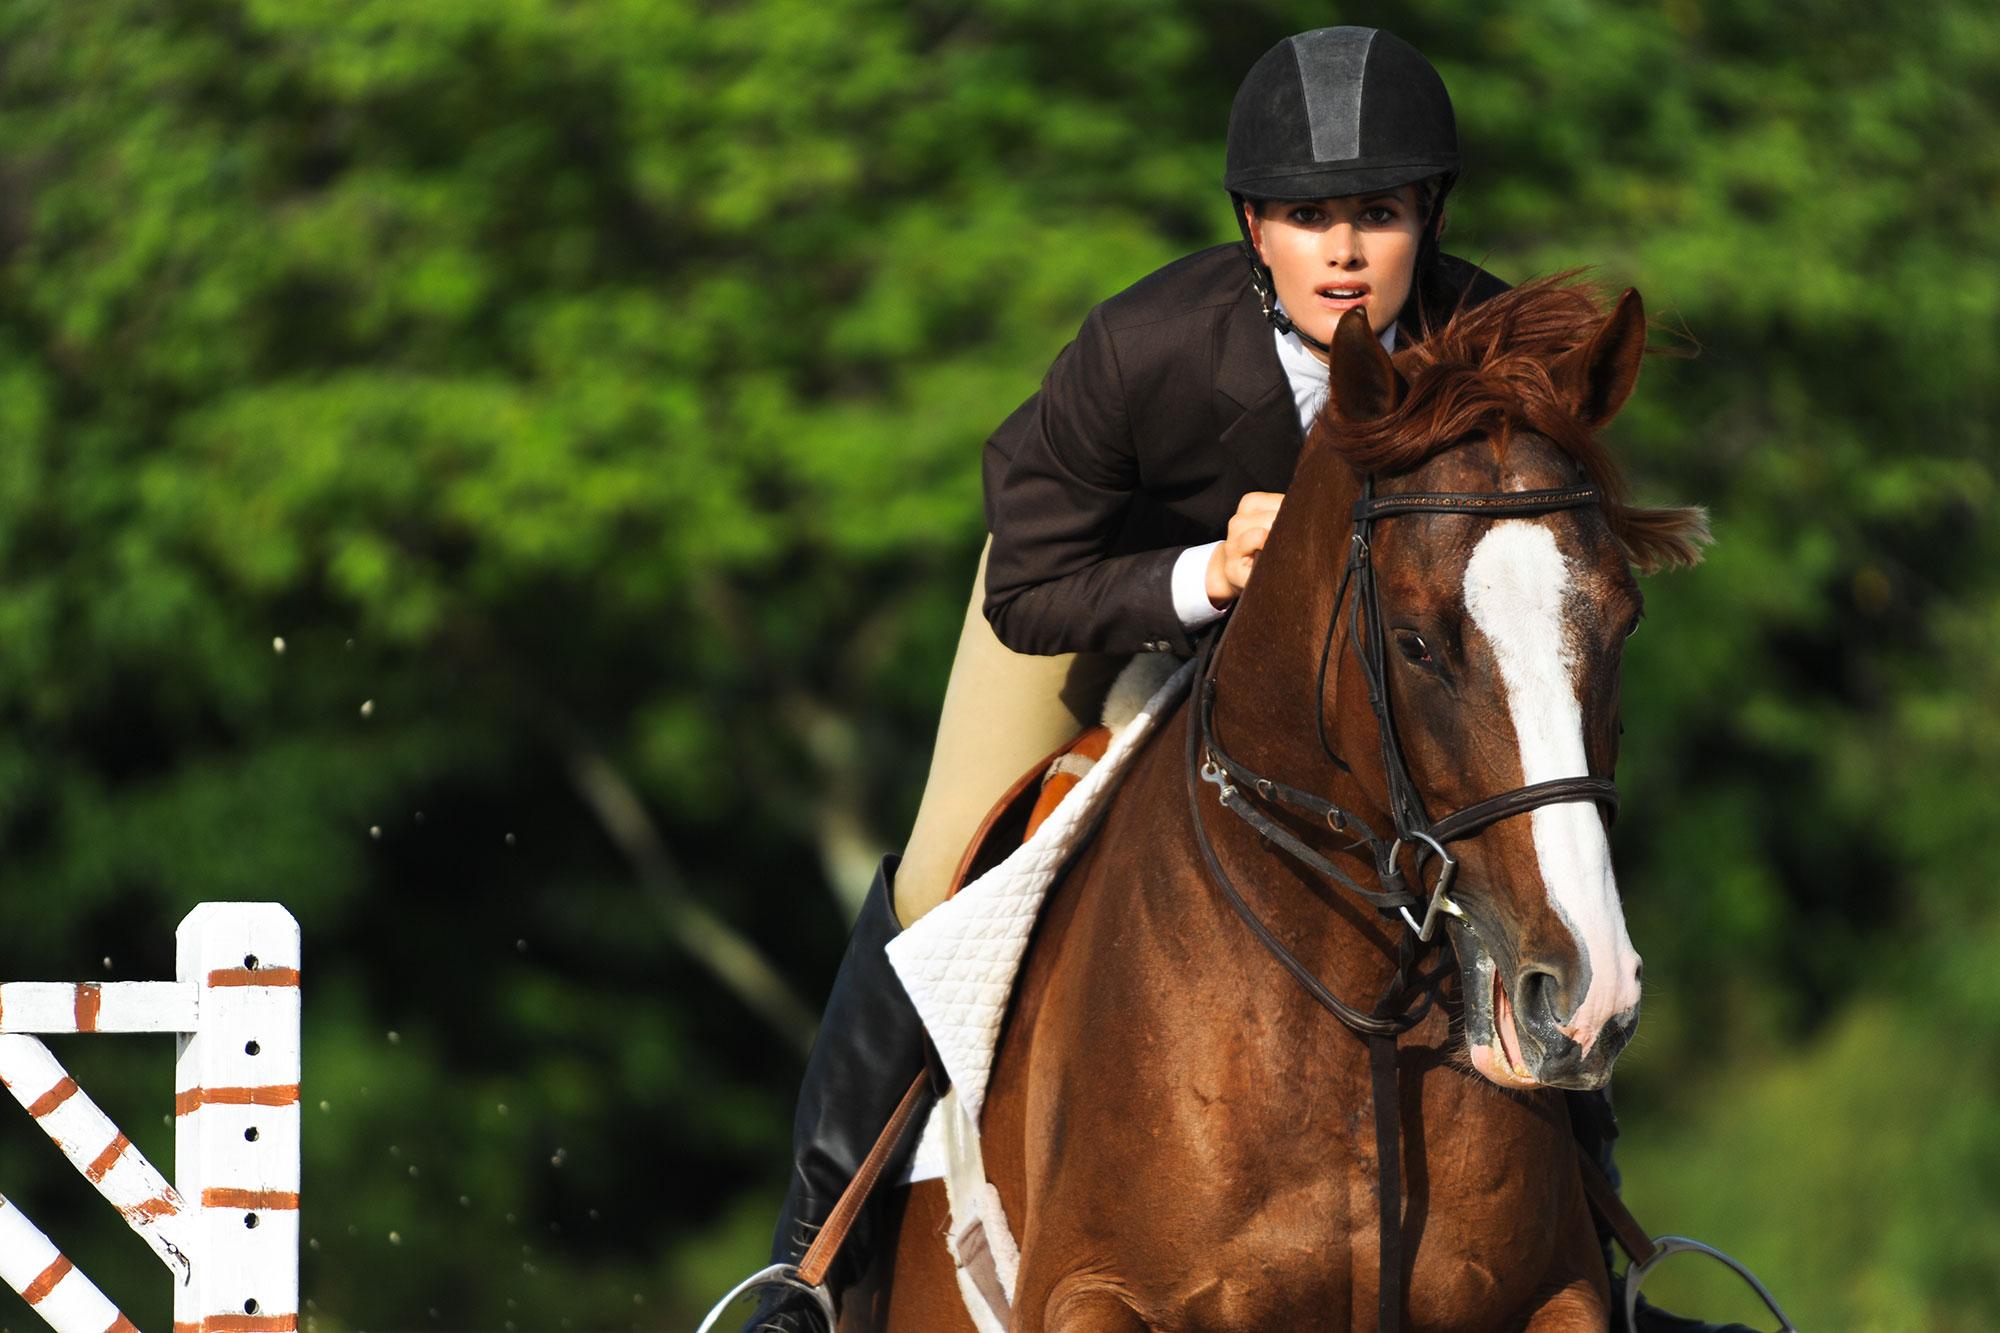 american-rv-hire-equestrian-events.jpg